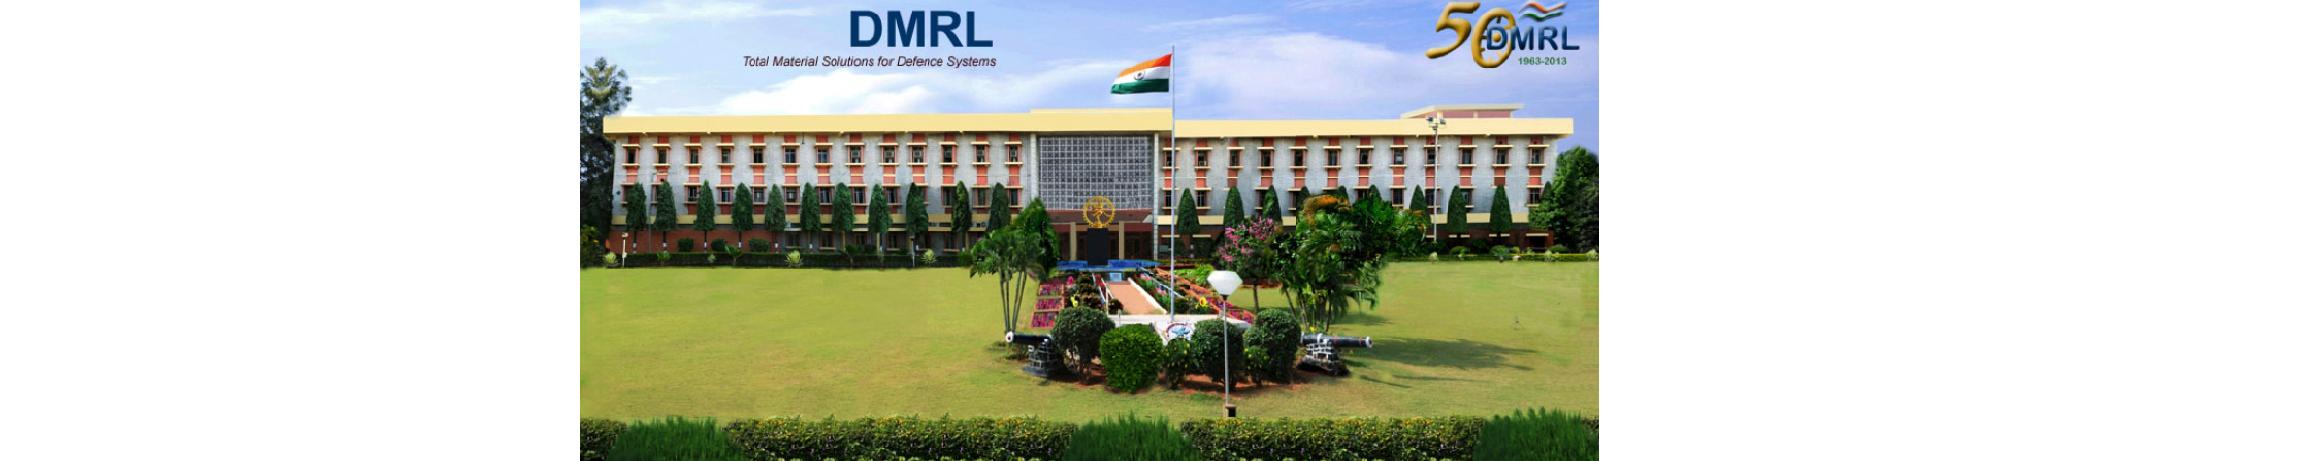 रक्षा धातुकर्म अनुसंधान प्रयोगशाला (DMRL)